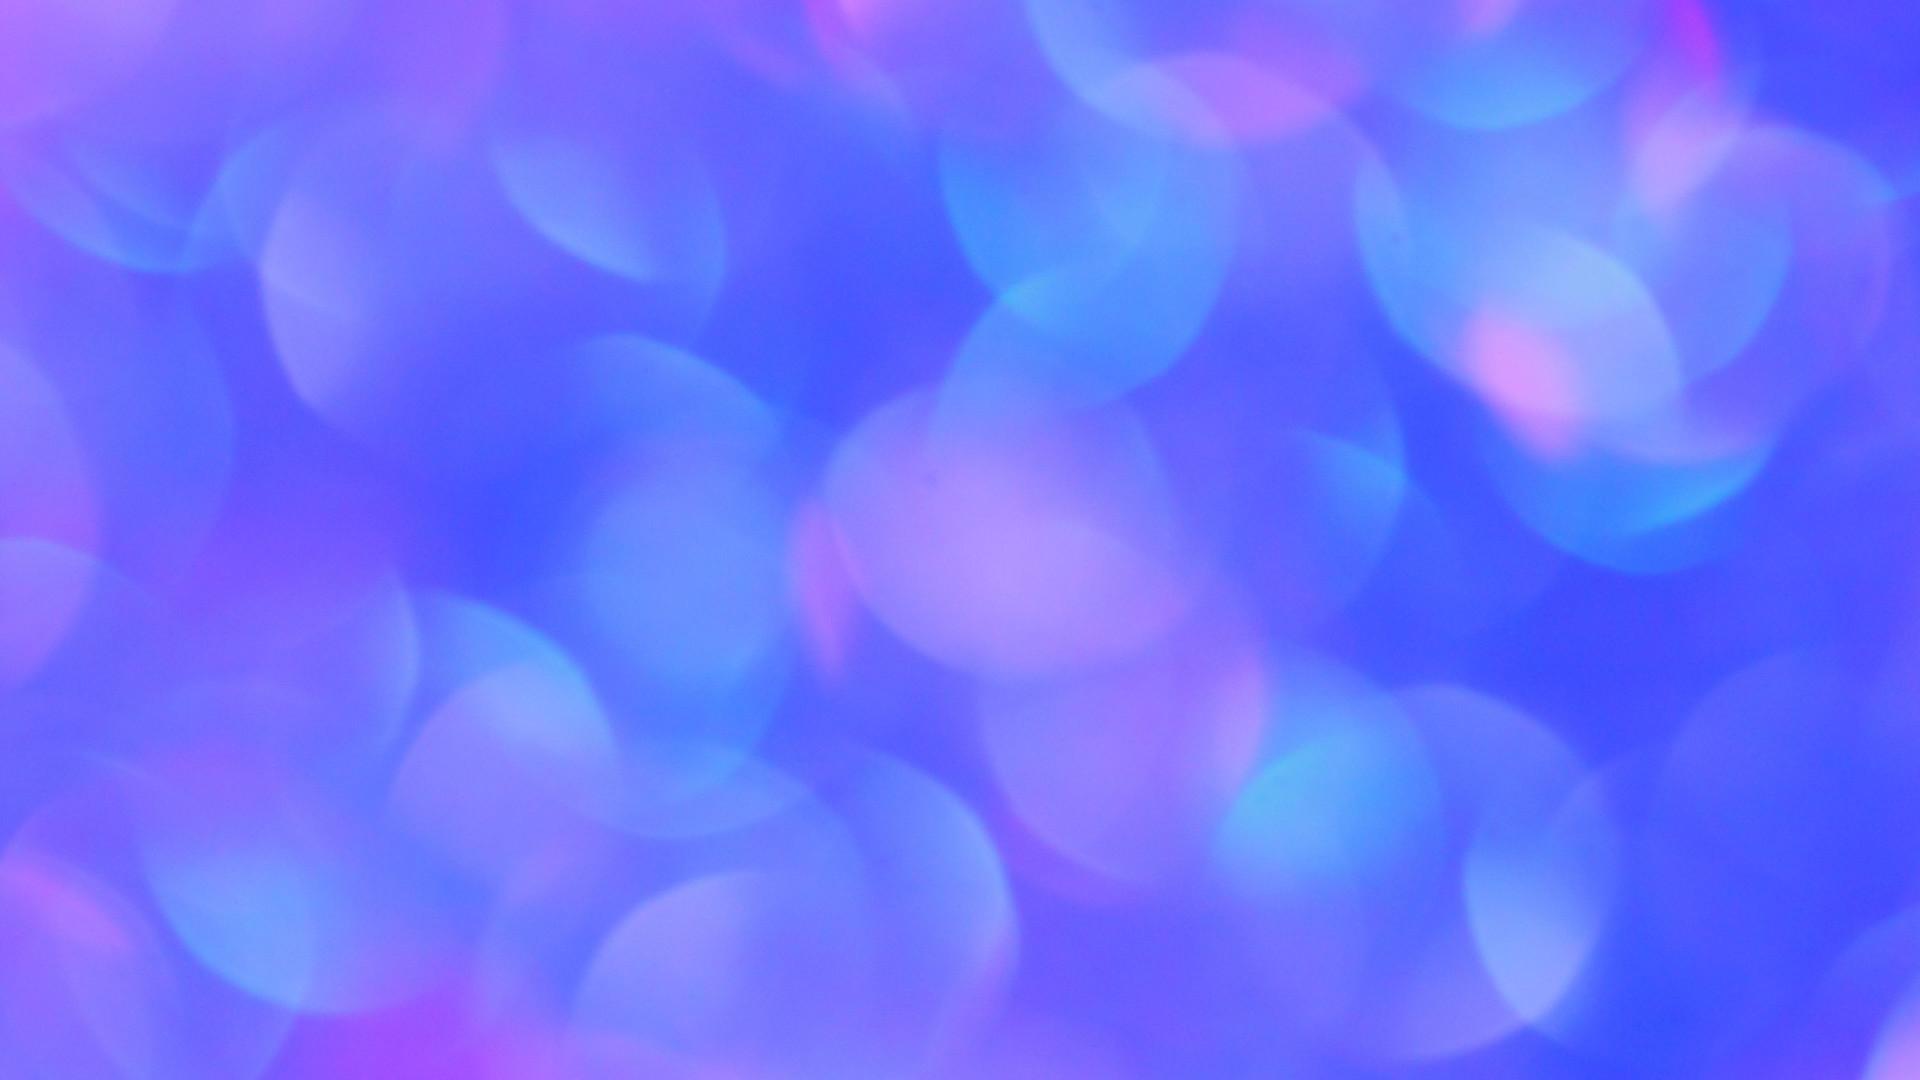 Blue Bubbles - Zoom Virtual Background